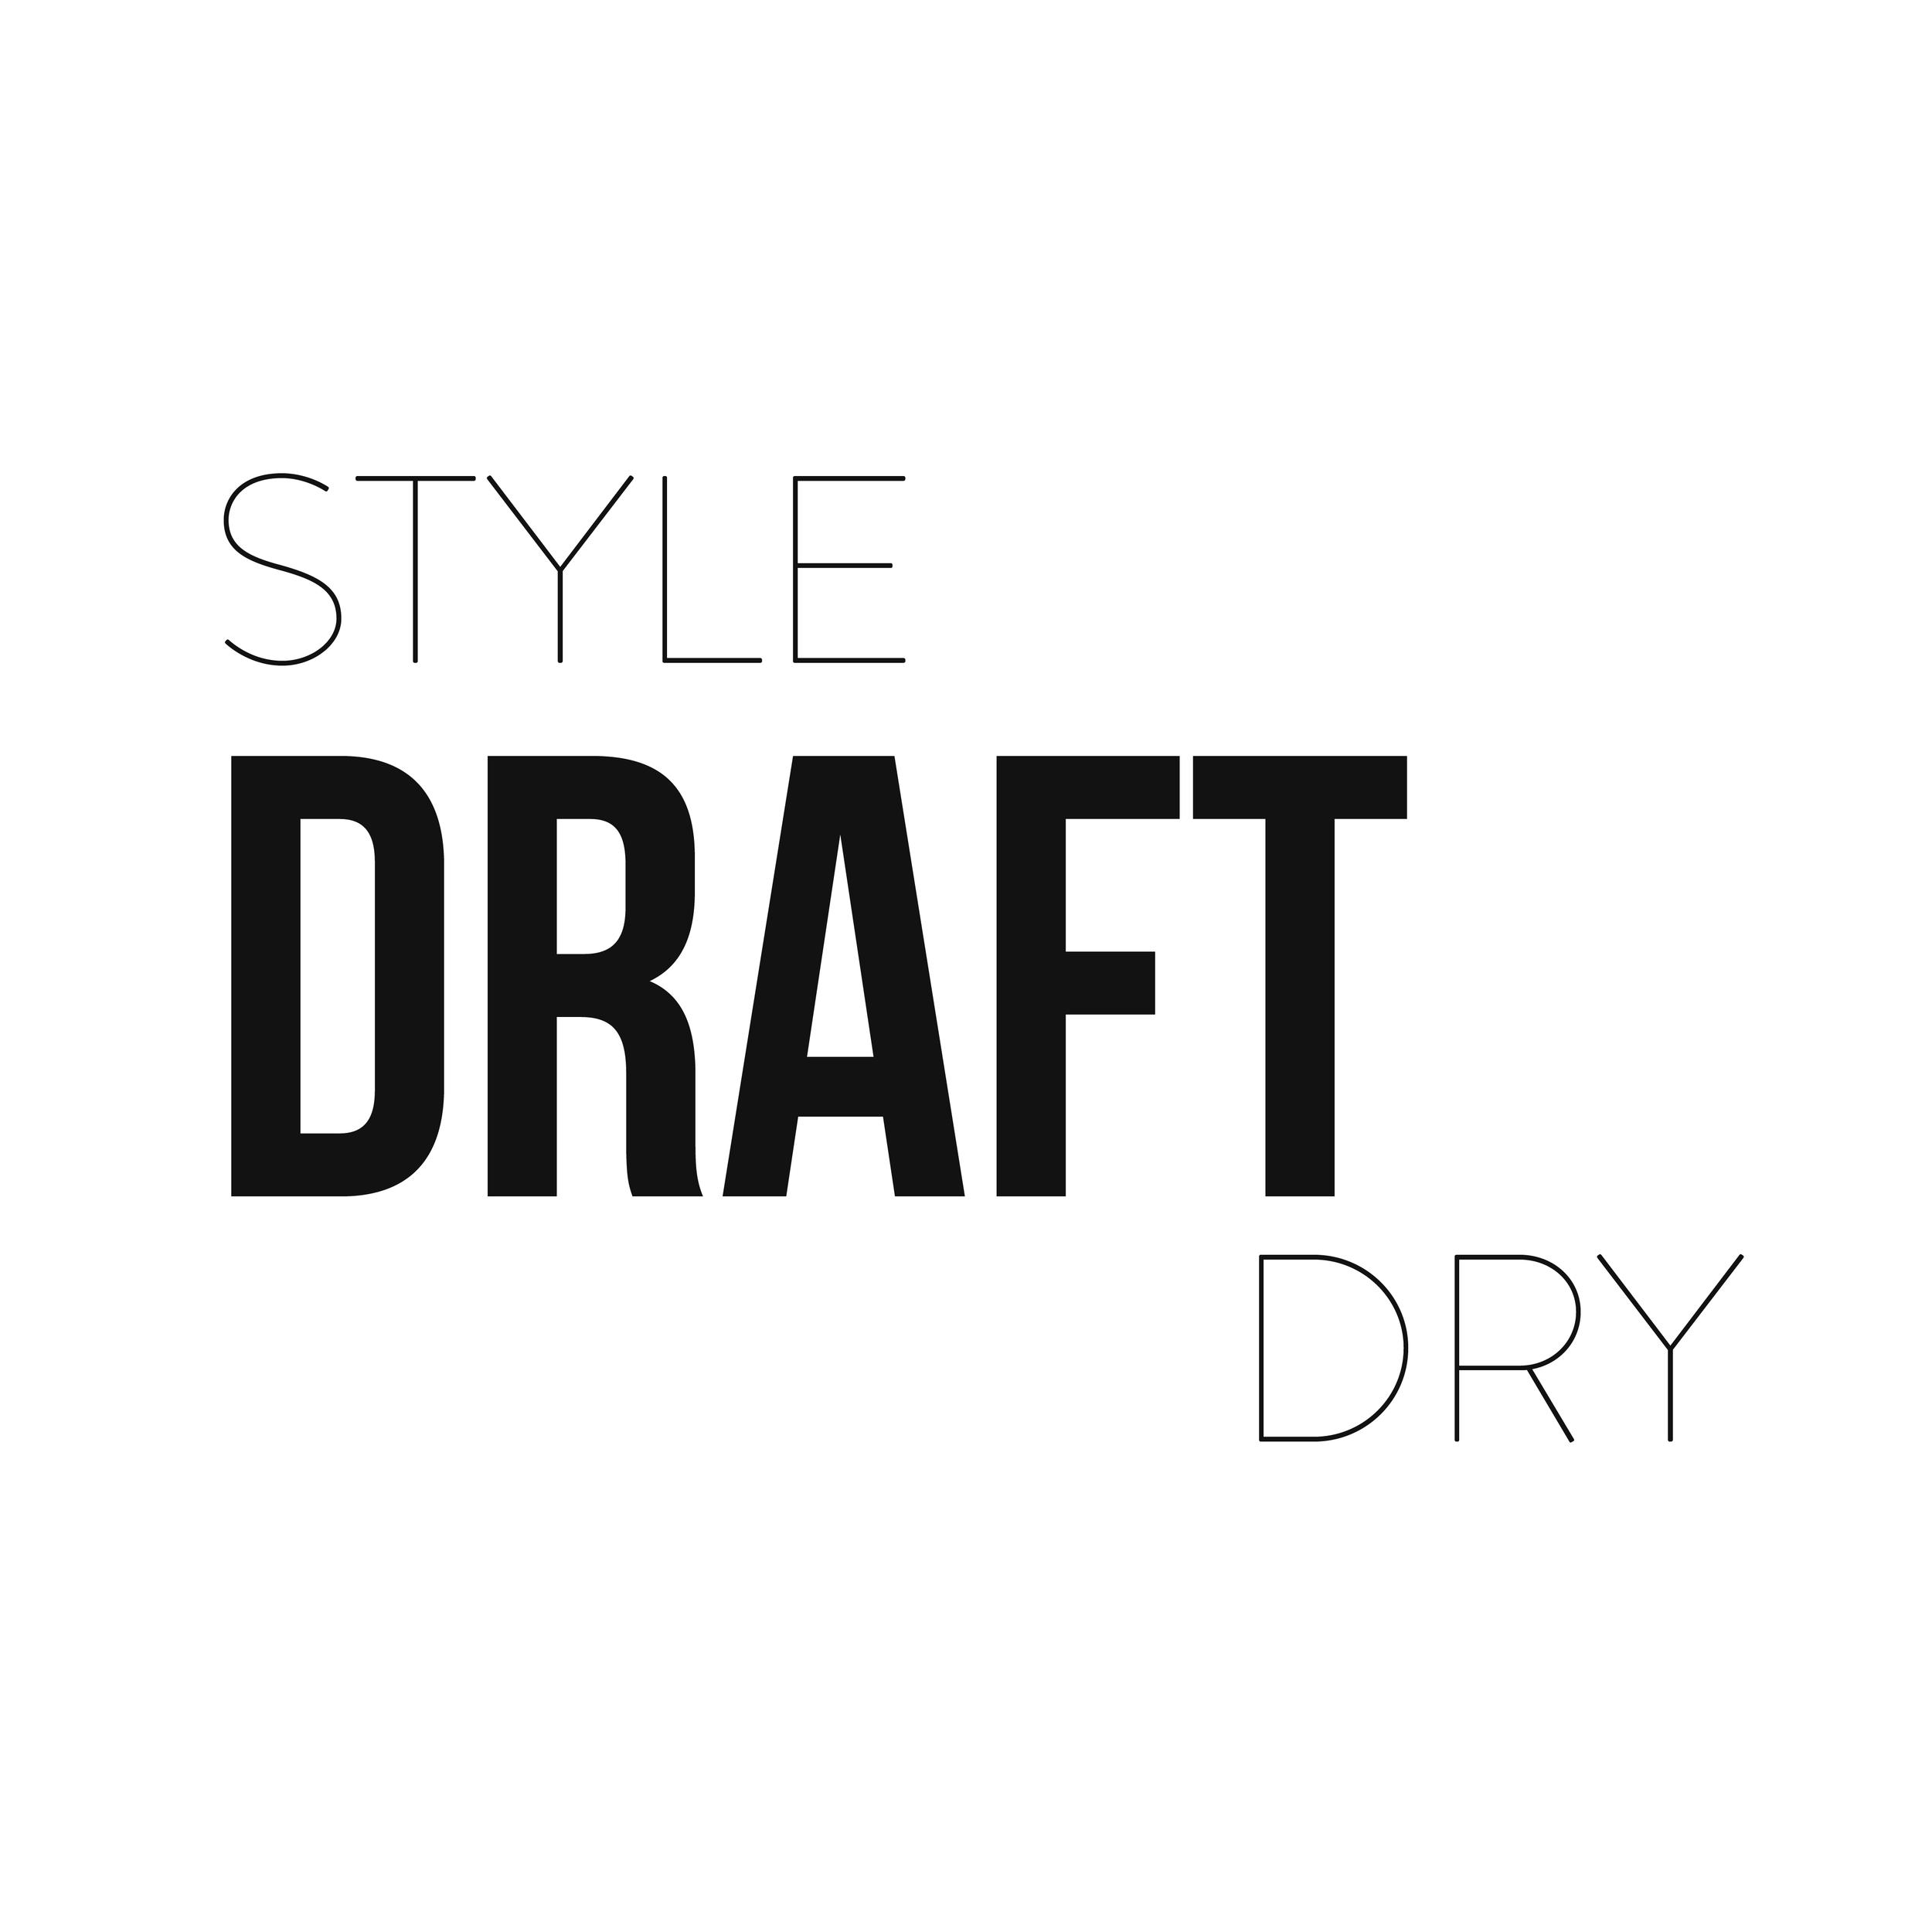 draftstat__DRAFT DRY.png